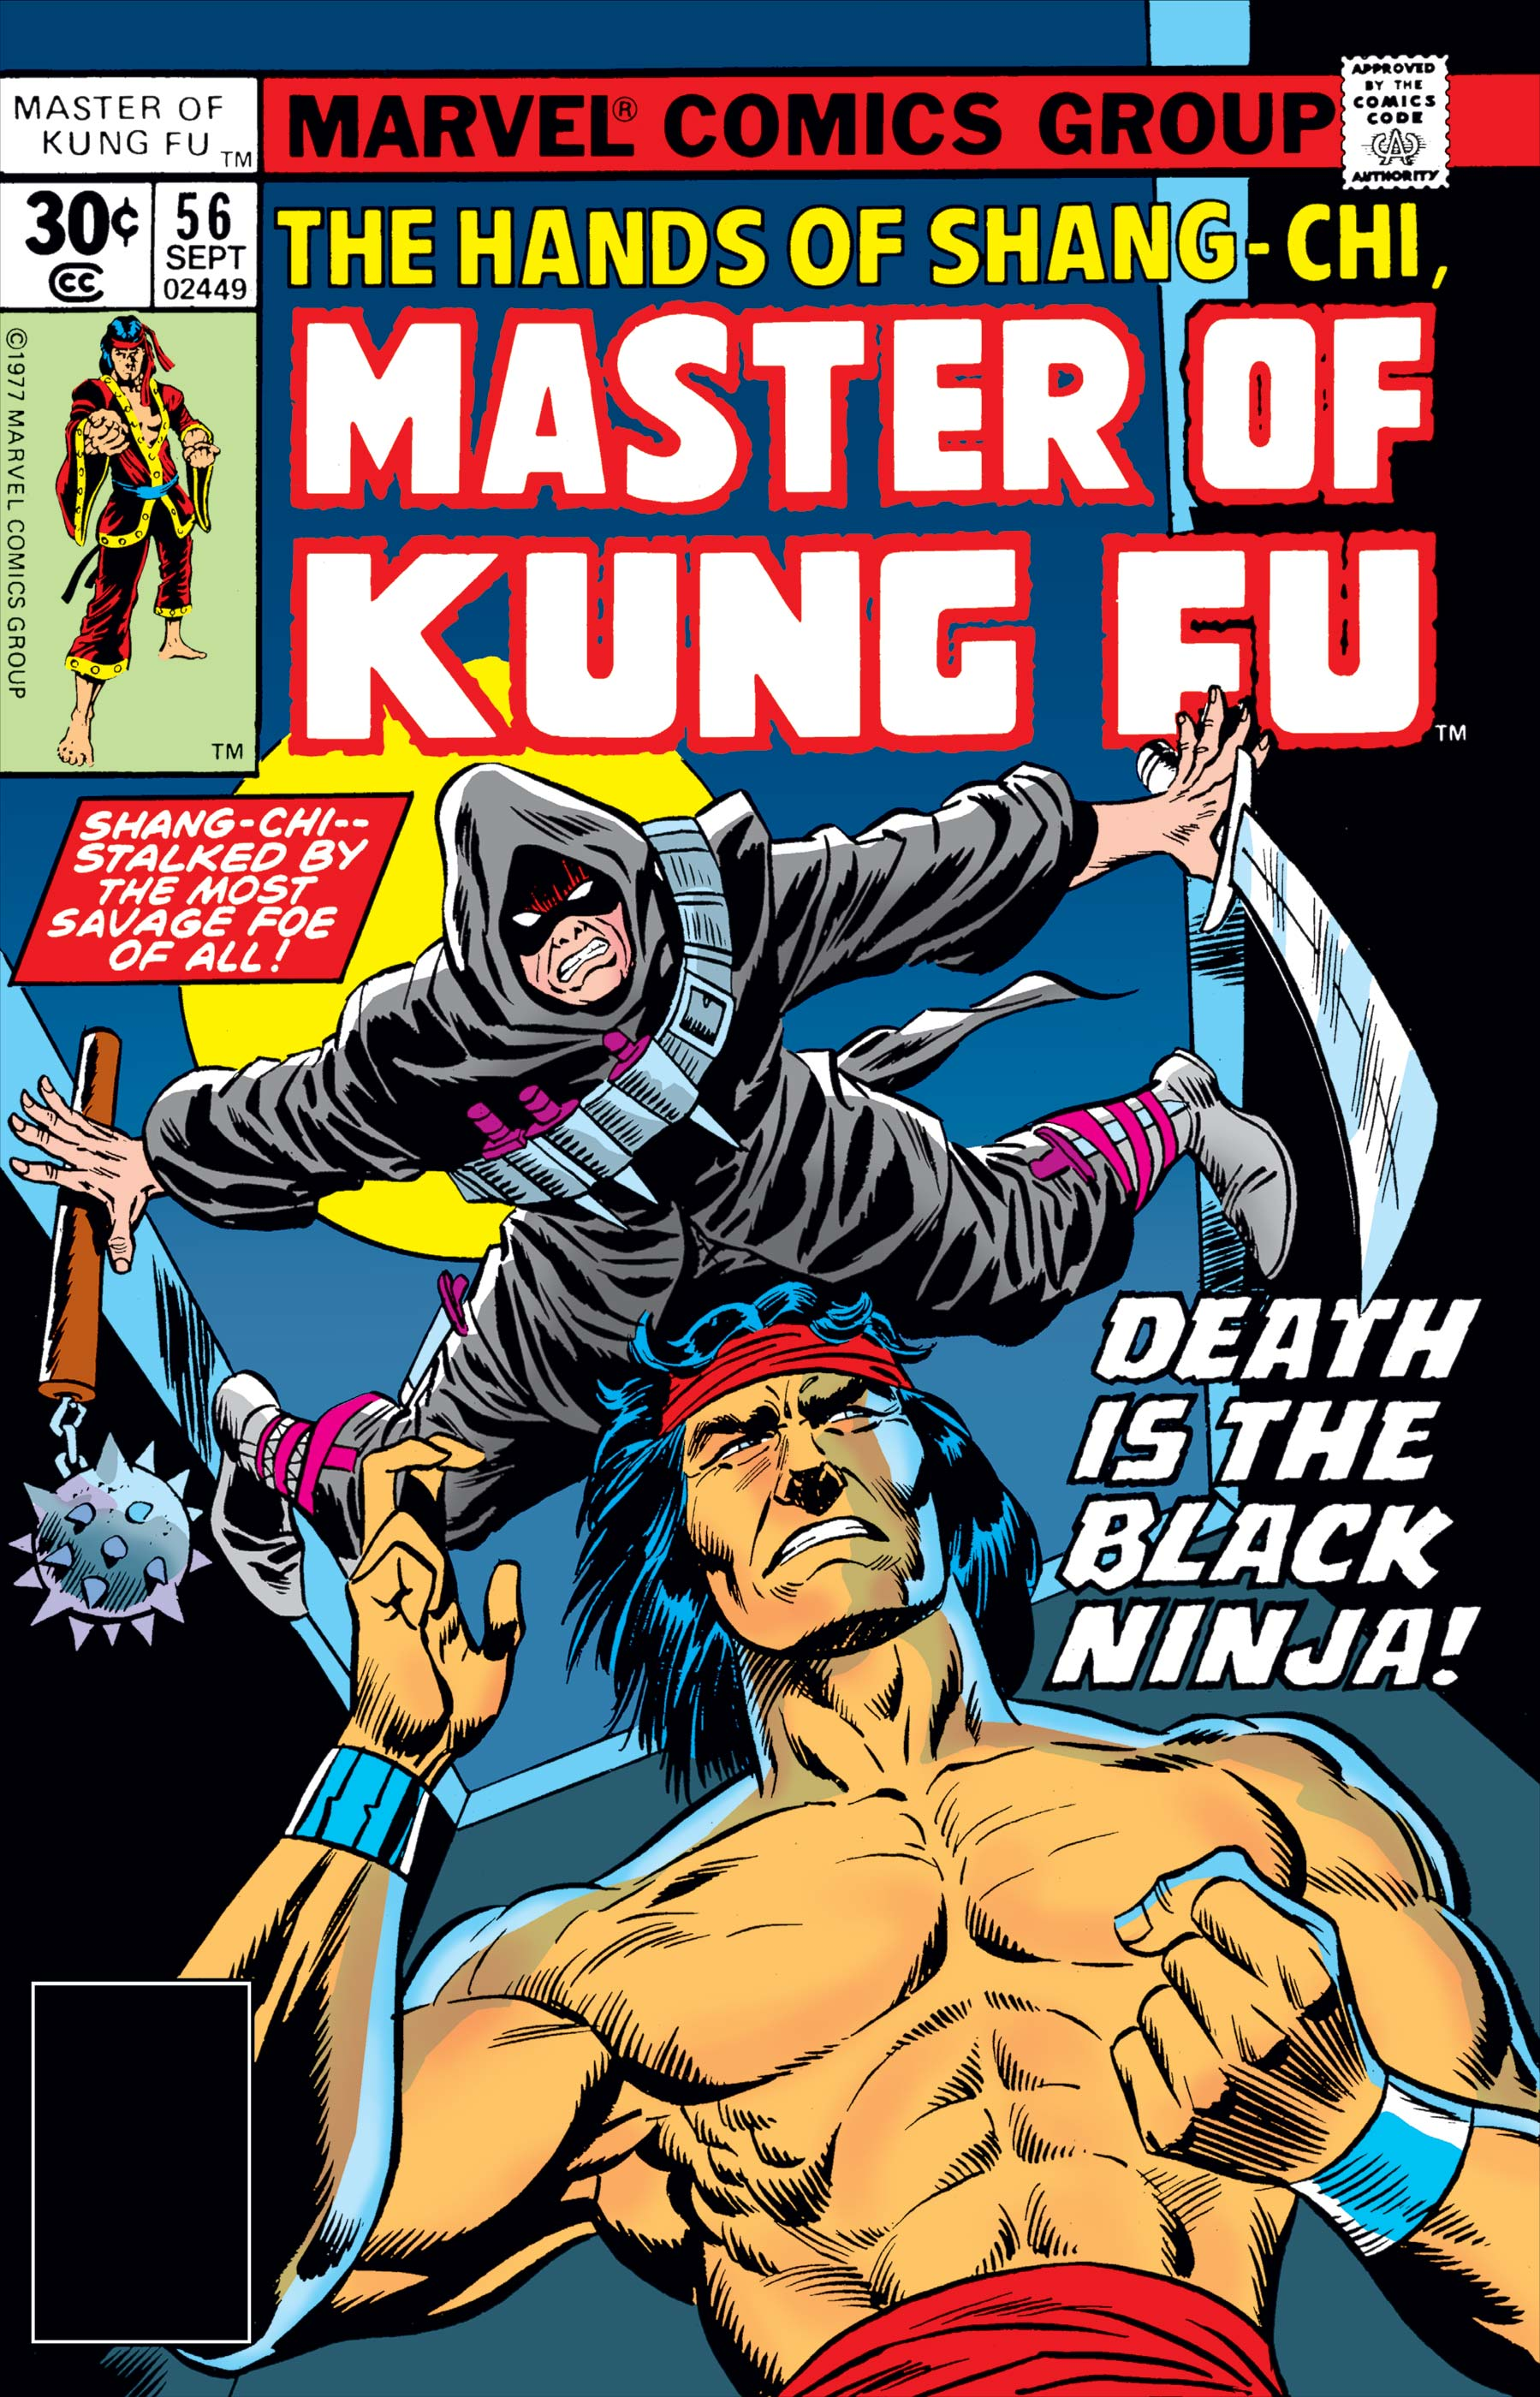 Master of Kung Fu (1974) #56